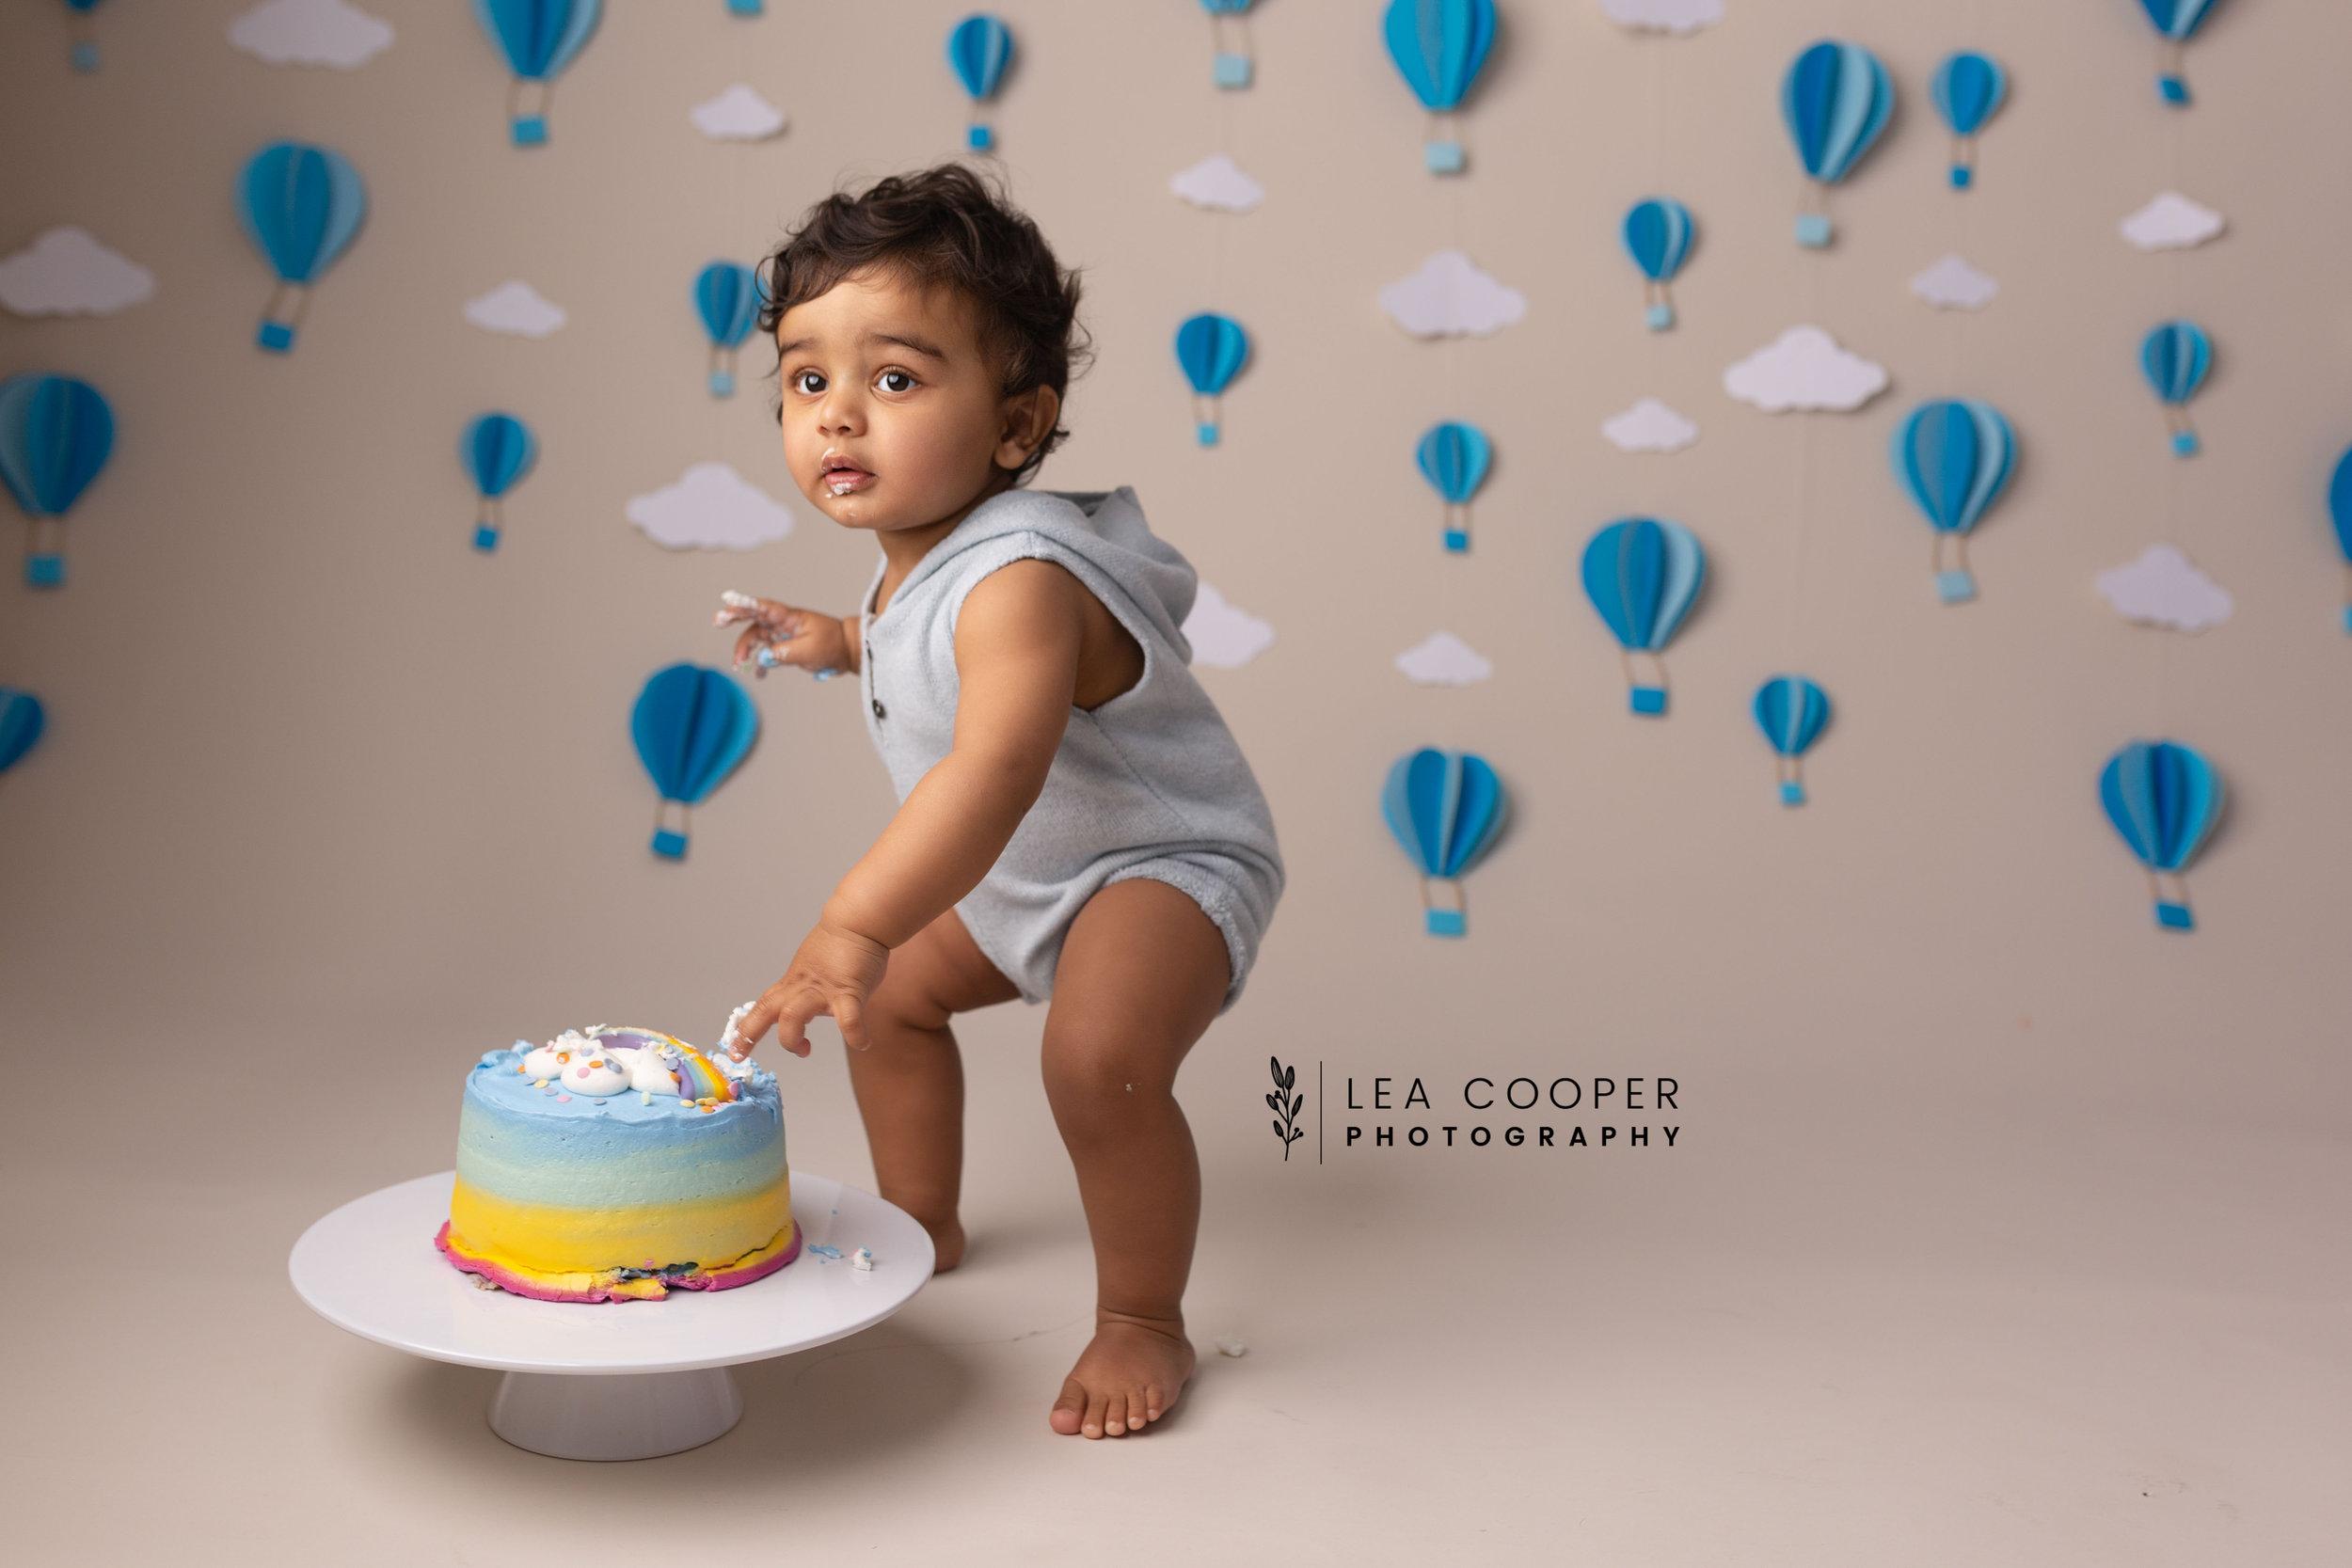 LEA-COOPER-PHOTOGRAPHY-CAKE-SMASH-PHOTOGRAPHER-WILLENALL-WOLVERHAMPTON-CHILD-PHOTOSHOOT-1ST—BIRTHDAY-PICTURES-WEDNESBURY-WALSALL-DUDLEY-WEST-MIDLANDS-UK-18.JPG